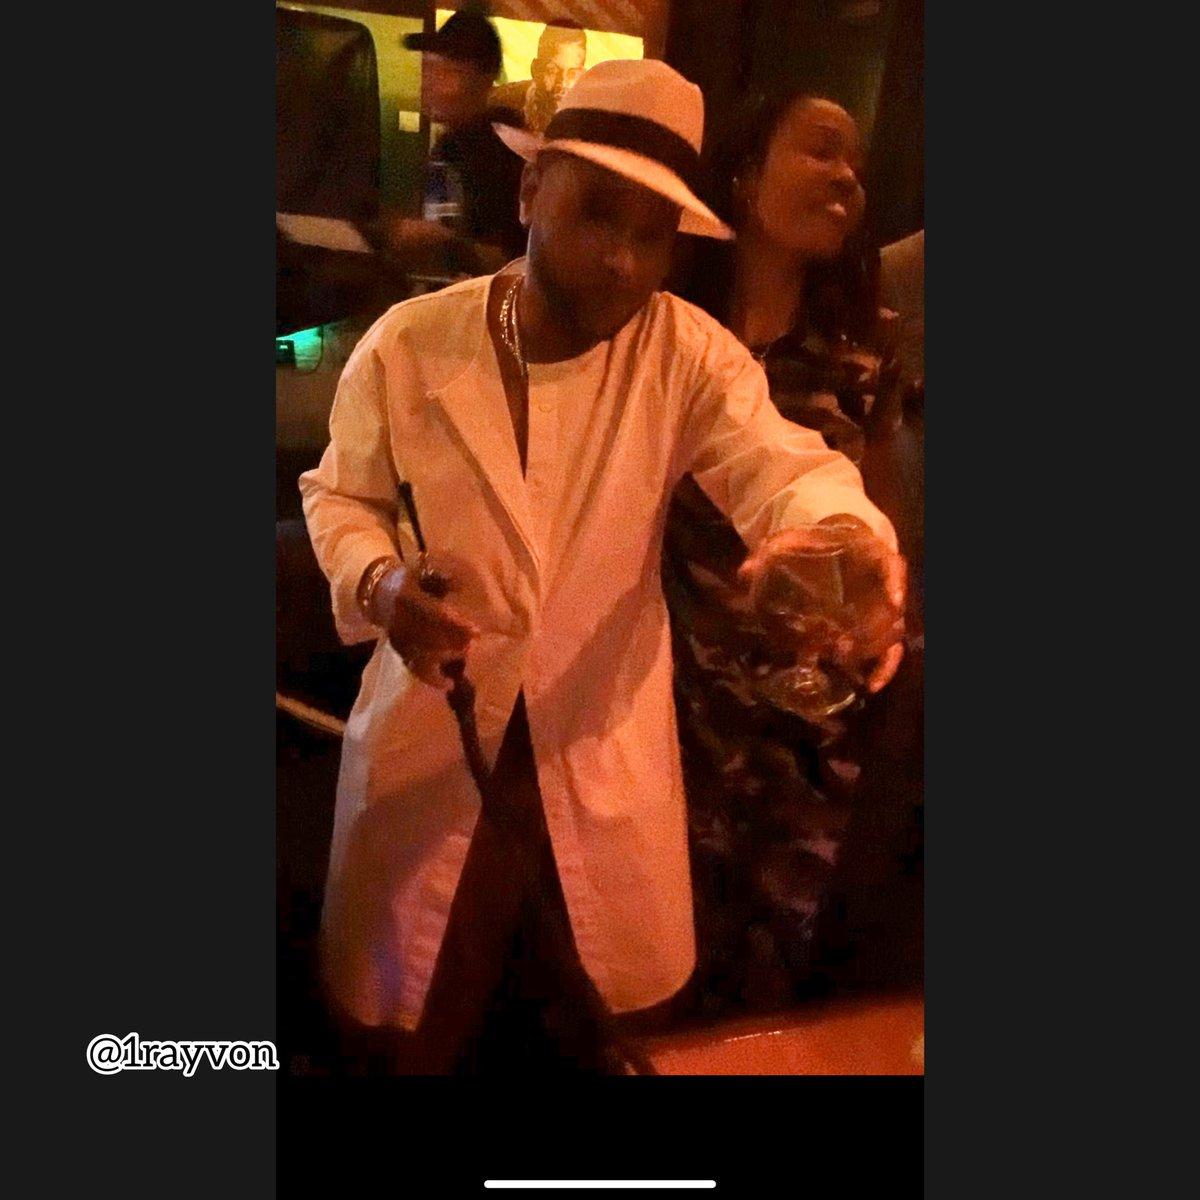 #Rayvon #earthstrong #bash w #djepps #sugarbear #artist #bashment #ladidadi #nogunsnomurder #classic #rollitrollit #video #settinz #racket #club #reggae #dancehall #music #dope #miami #beach #live #show #mad #innareallife #gtcent #getthatcheddarentertainment